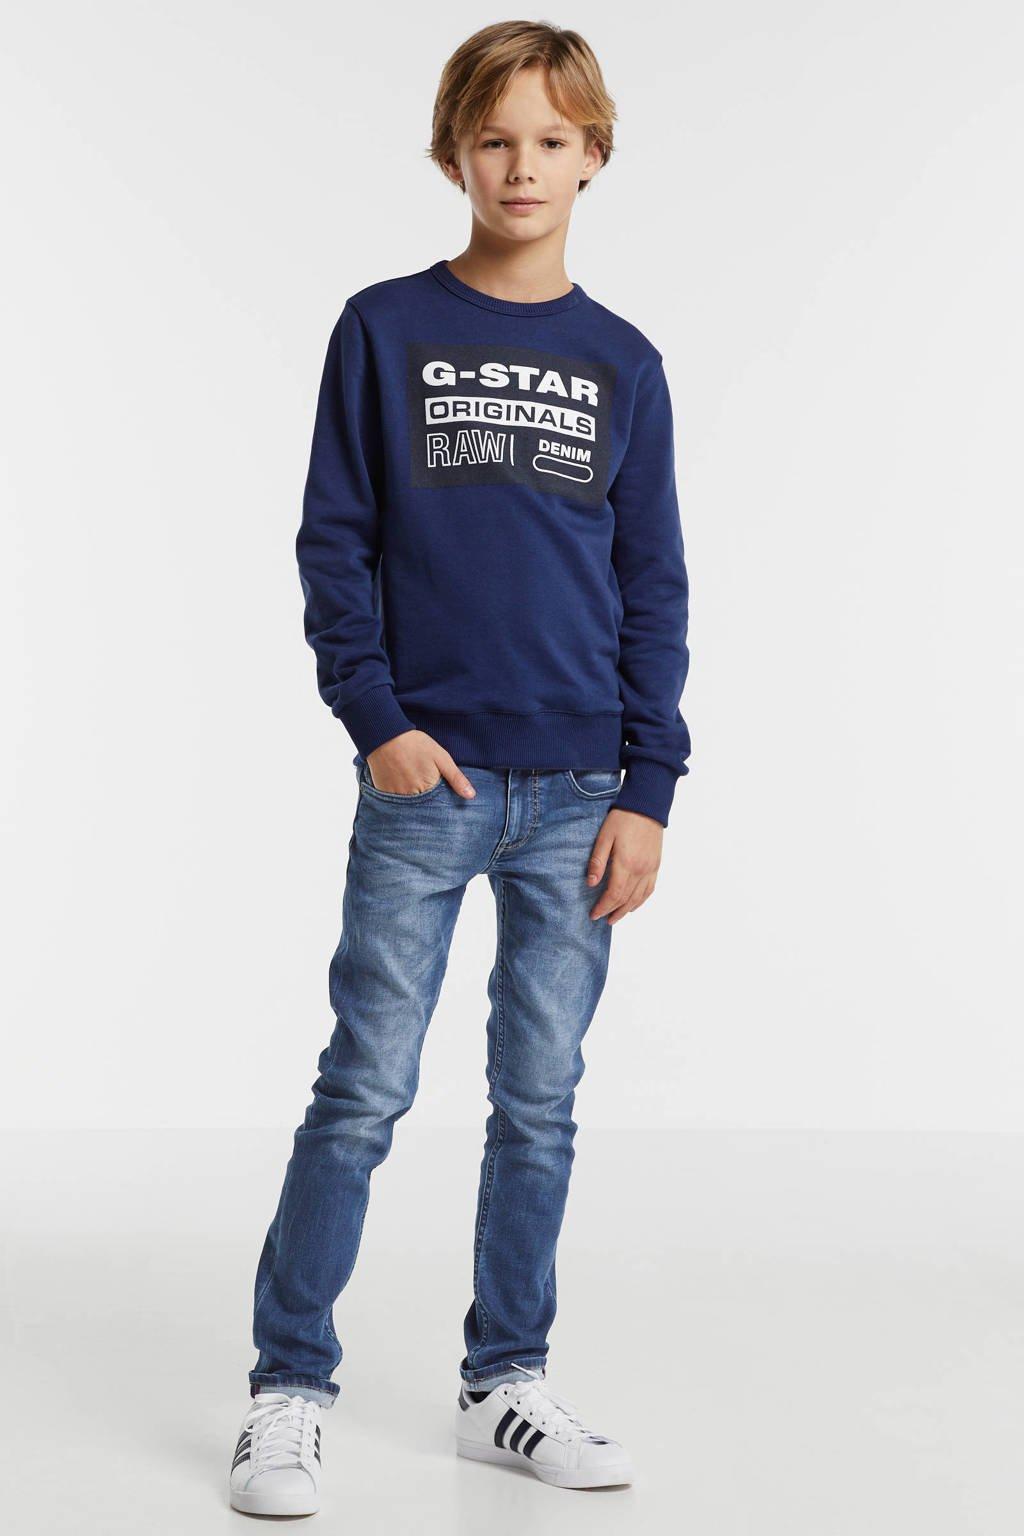 G-Star RAW sweater Hodin met logo donkerblauw/wit/zwart, Donkerblauw/wit/zwart